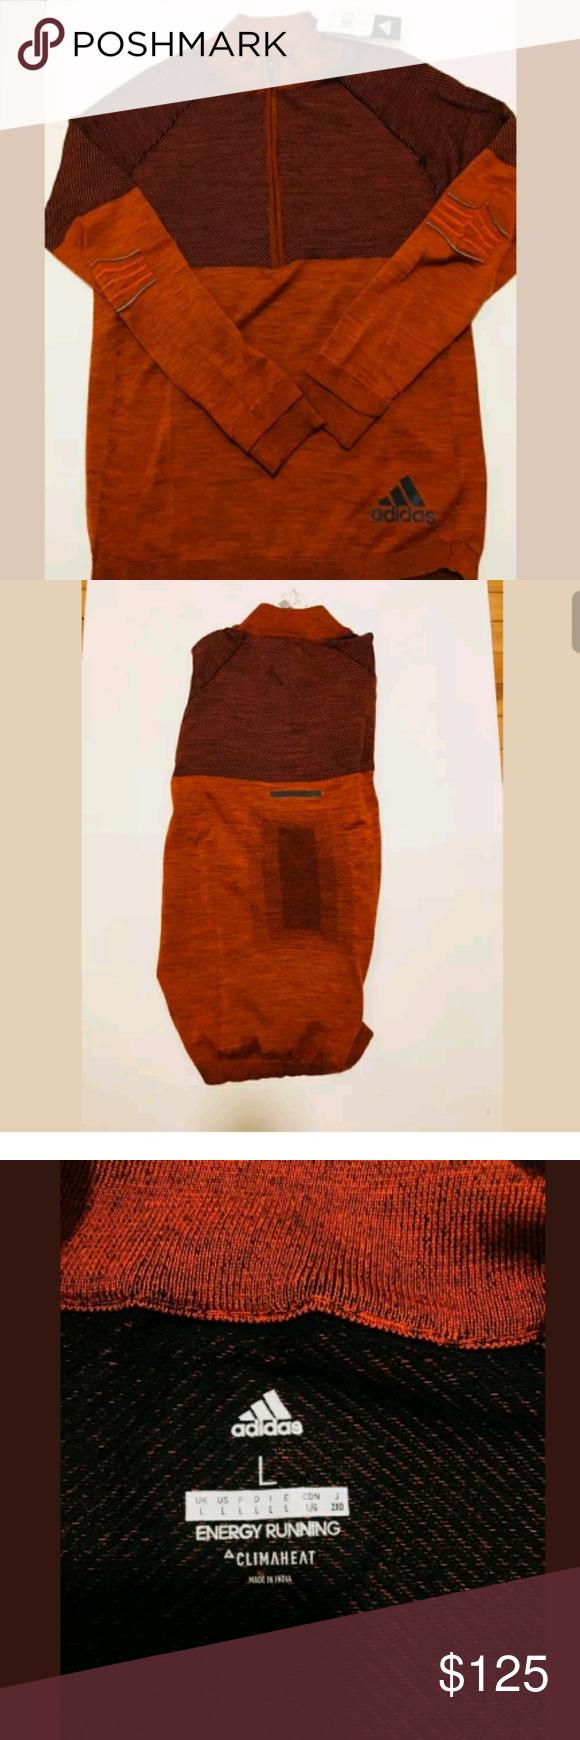 Nwt Adidas Running Climaheat Primeknit Sz L Clothes Design Fashion Fashion Design [ 1740 x 580 Pixel ]